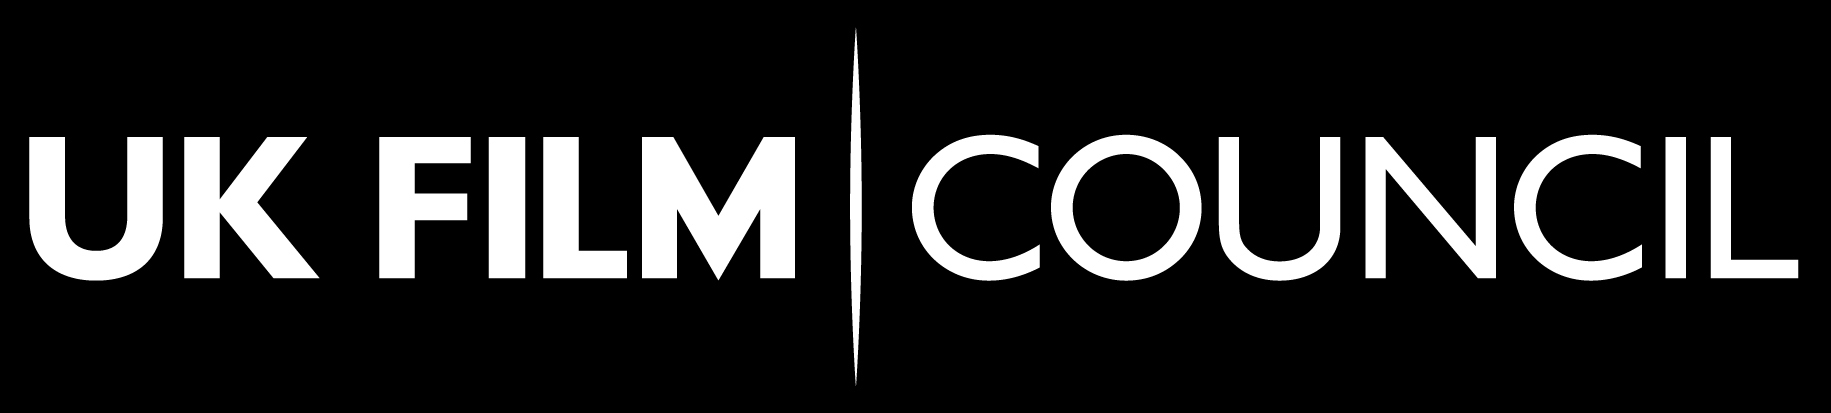 UK_Film_Council